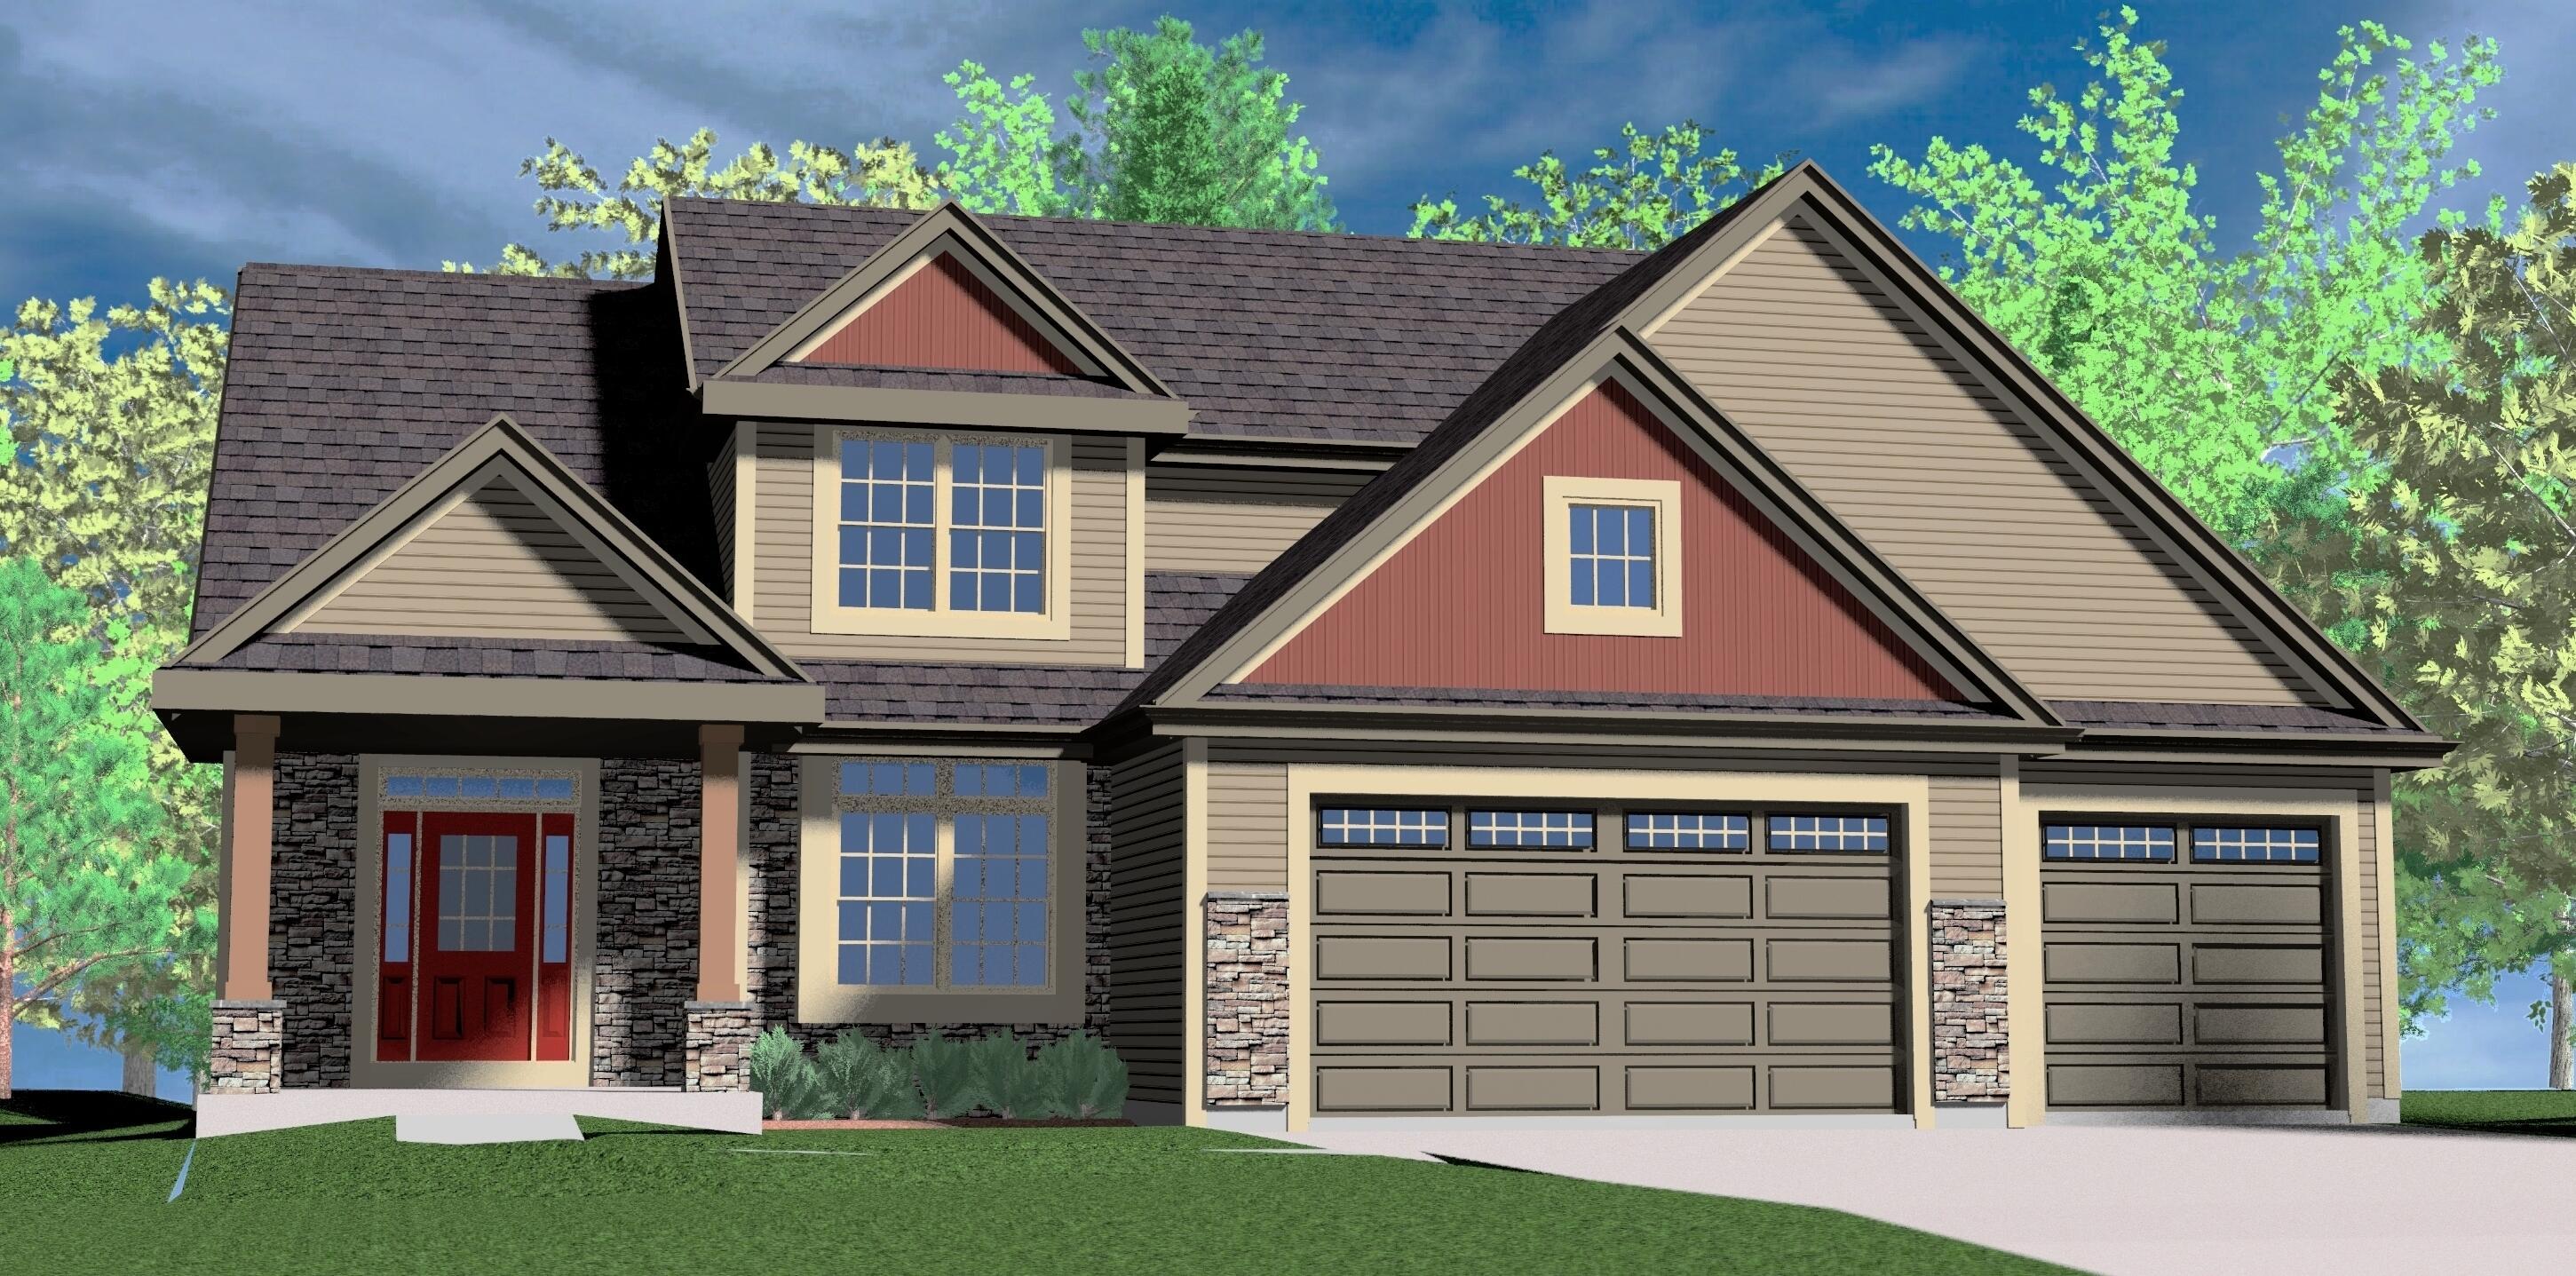 N47W22488 Woodleaf Way, Pewaukee, Wisconsin 53072, 4 Bedrooms Bedrooms, 11 Rooms Rooms,2 BathroomsBathrooms,Single-Family,For Sale,Woodleaf Way,1764726